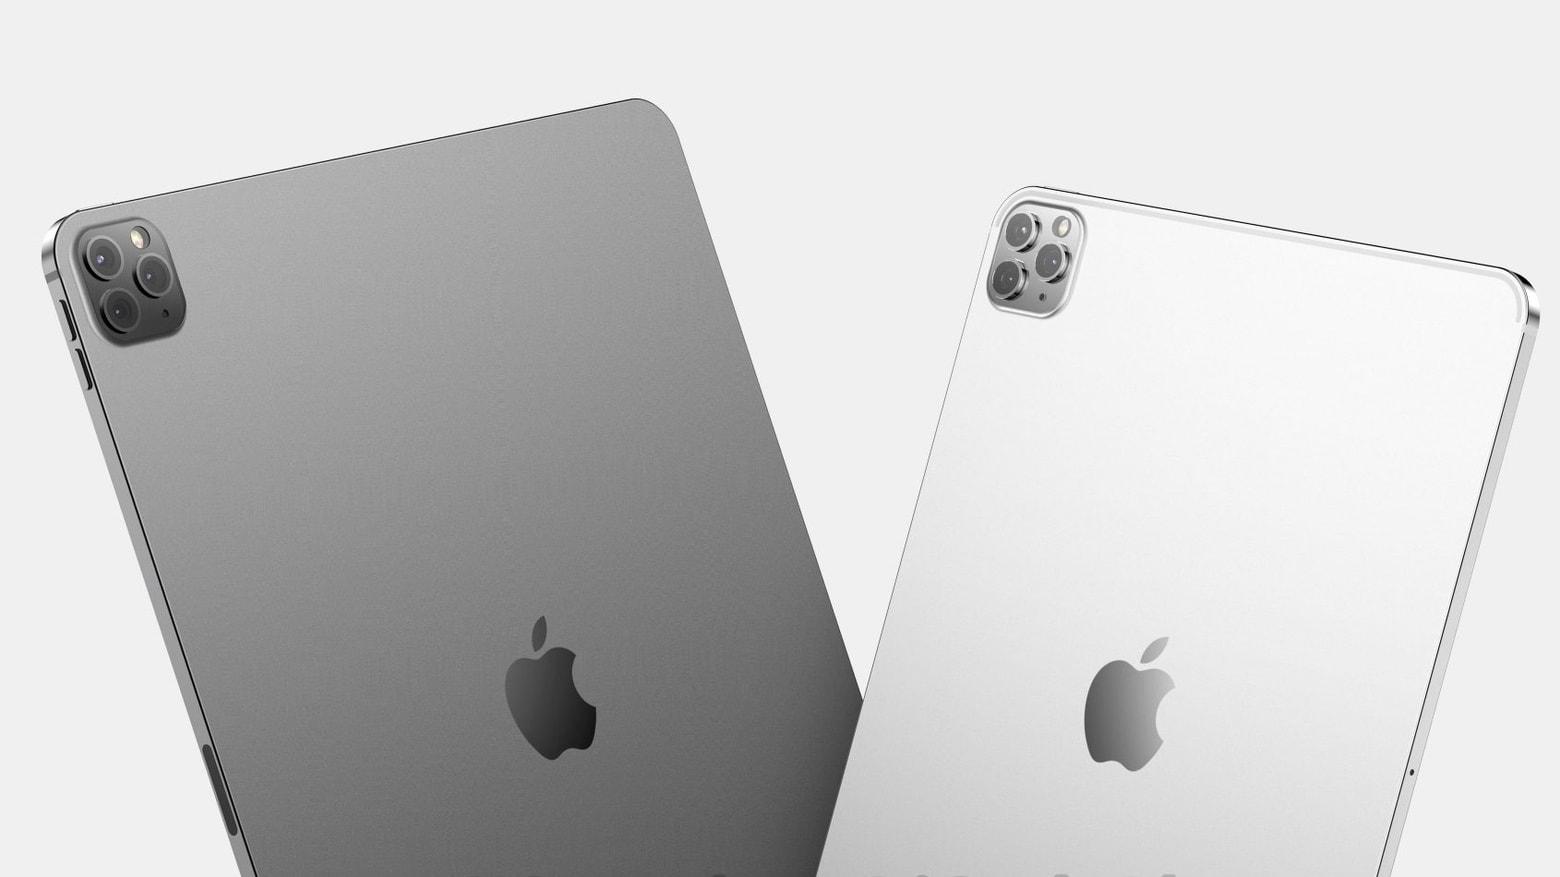 This 2020 iPad Pro render is based on rumors